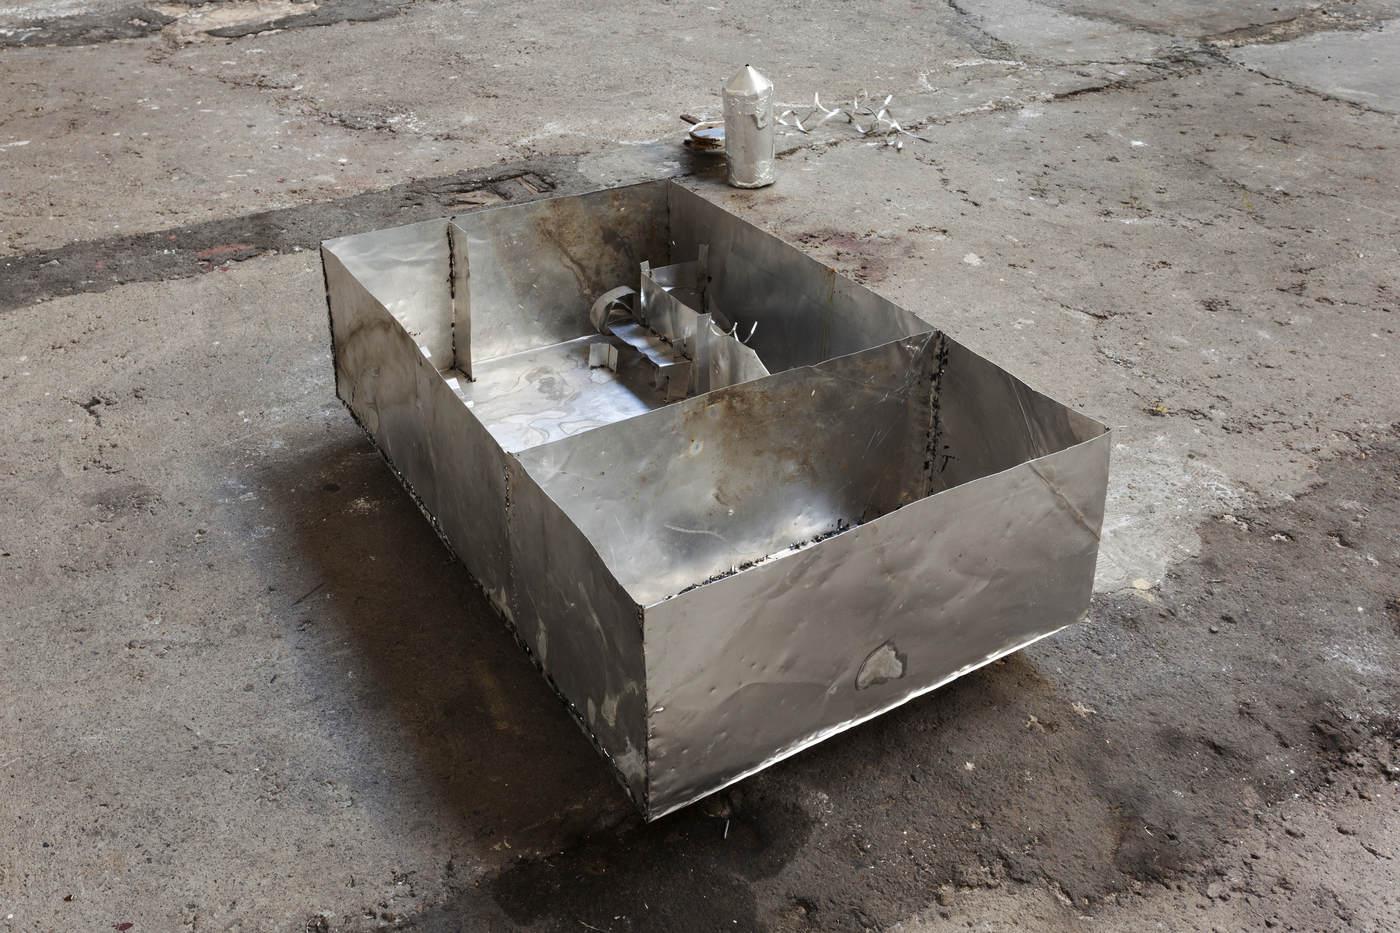 09-Oa4s-hive box-1857